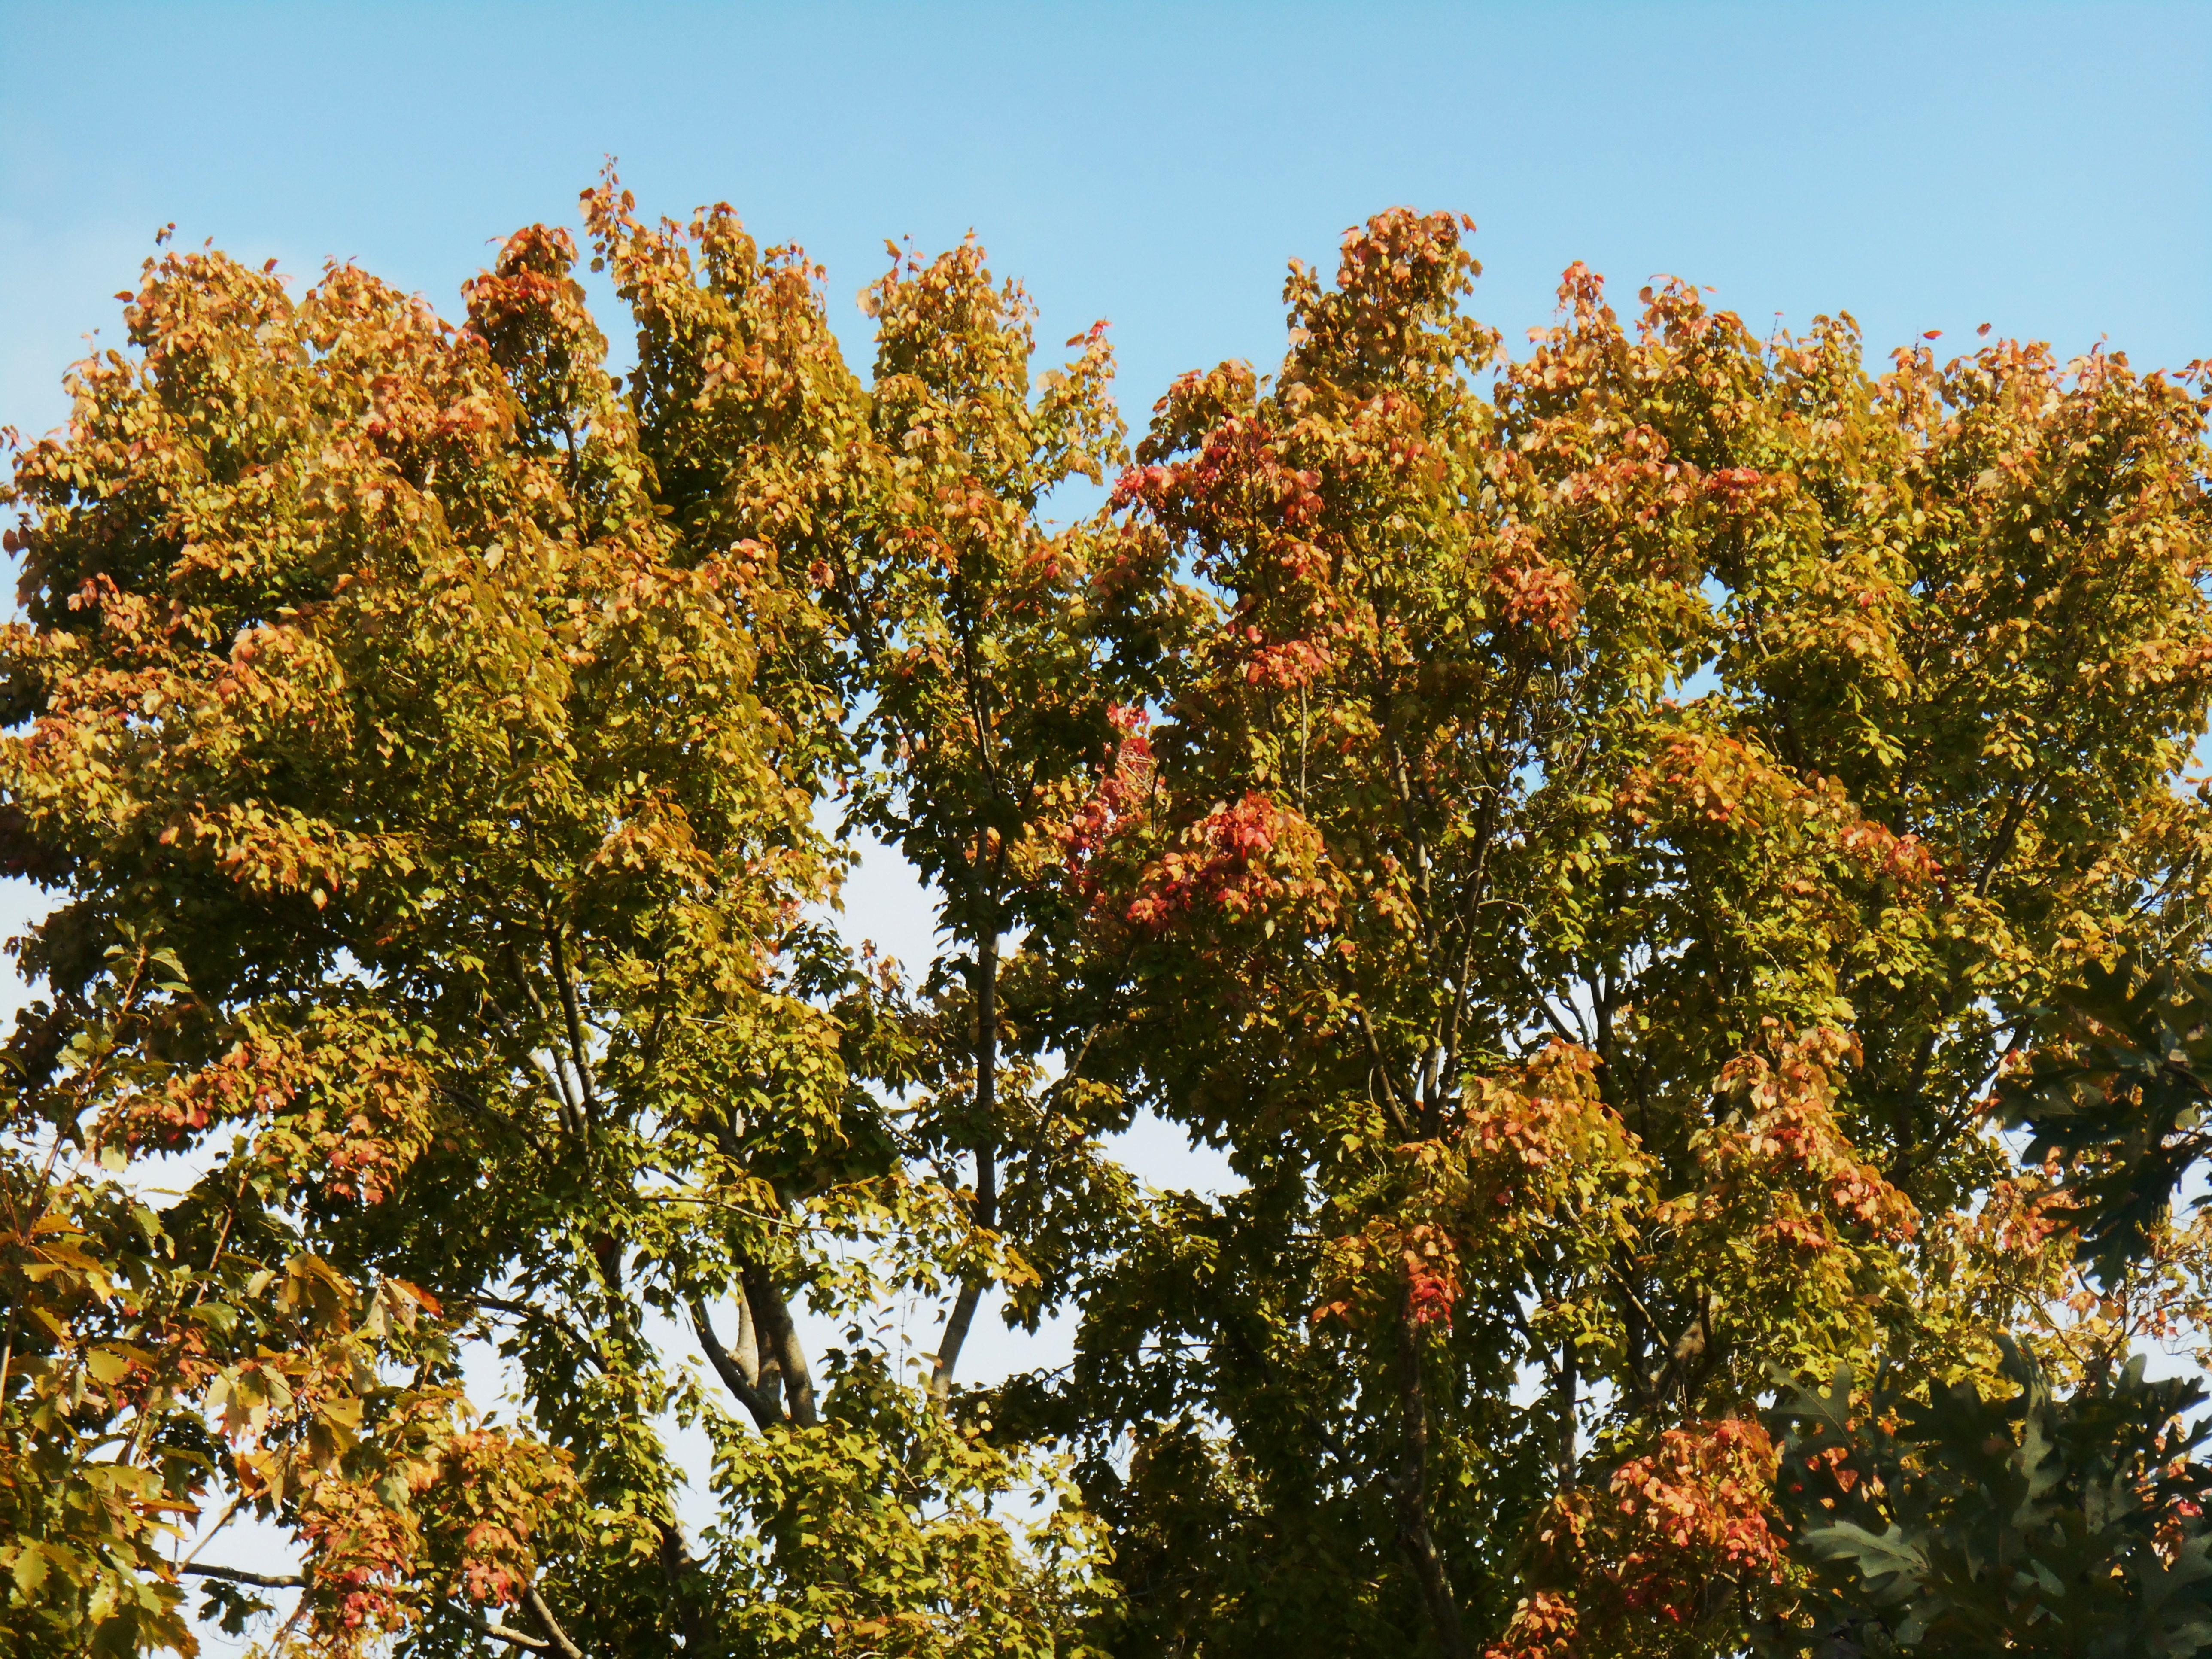 October 23, 2015 trees 024